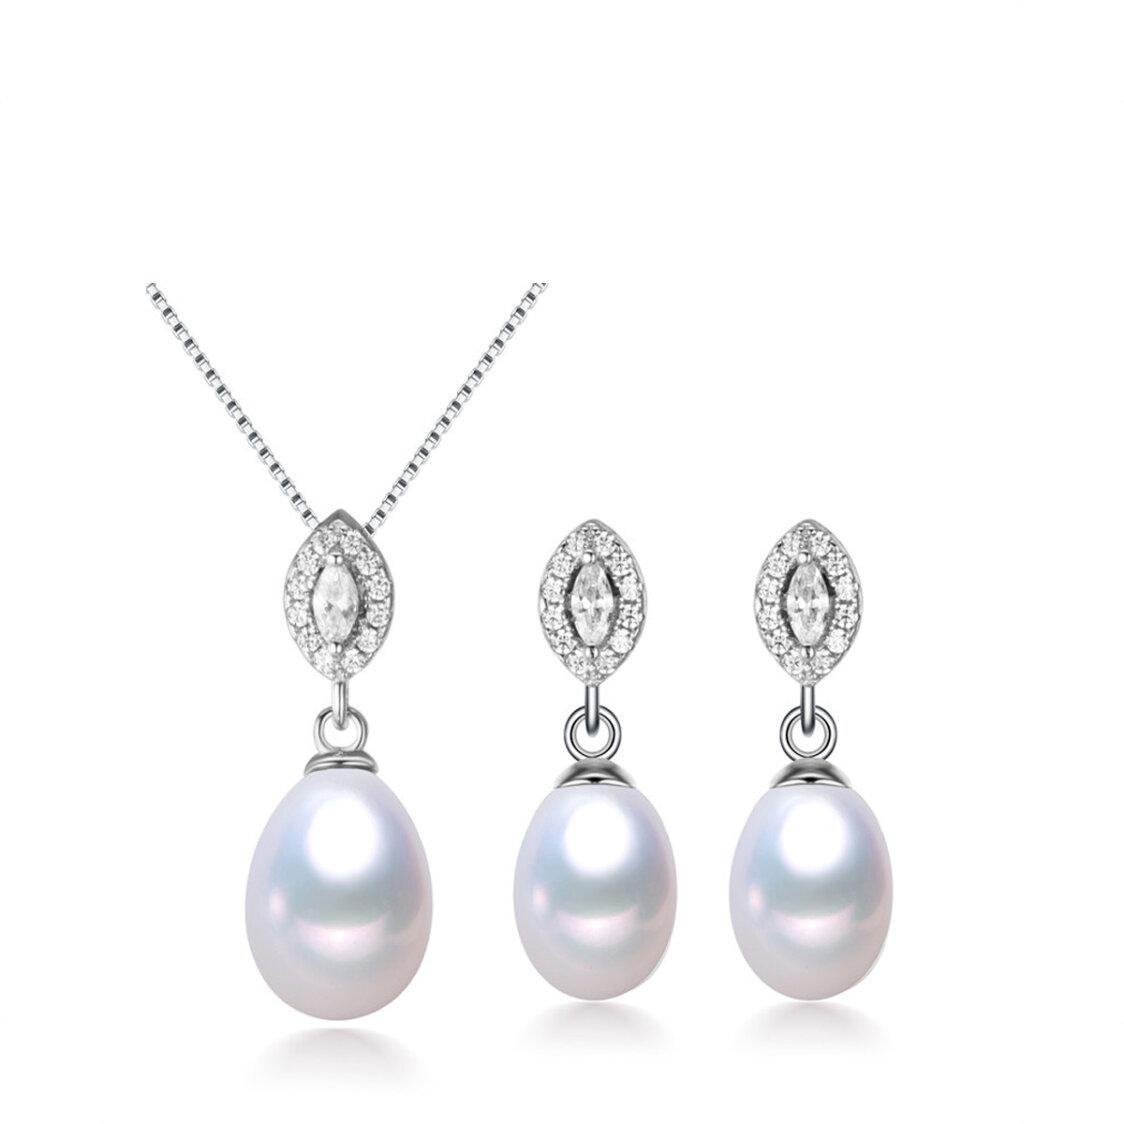 Fresh Water Pearl Pendant  Earrings Set in 925 Sterling Silver - EJset4